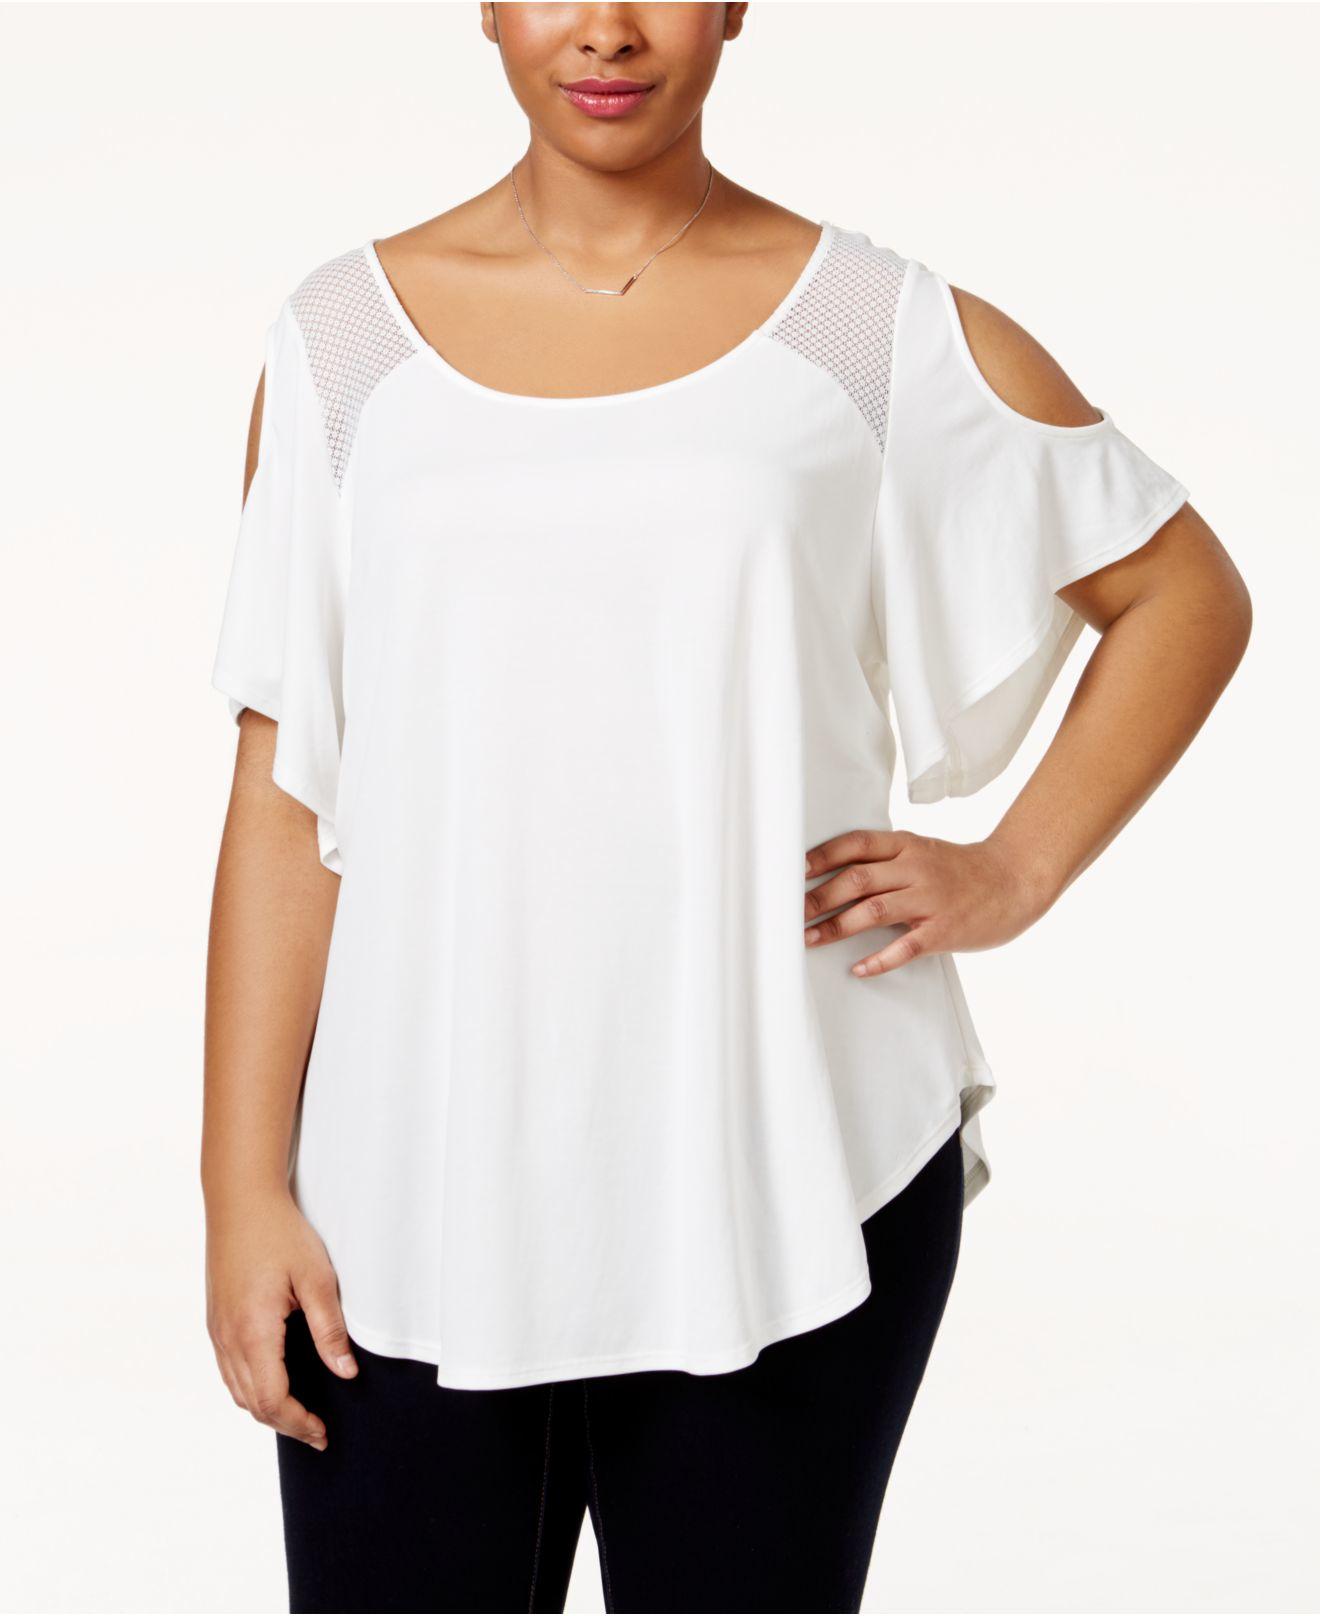 Dressy White Tops Plus Size Anlis